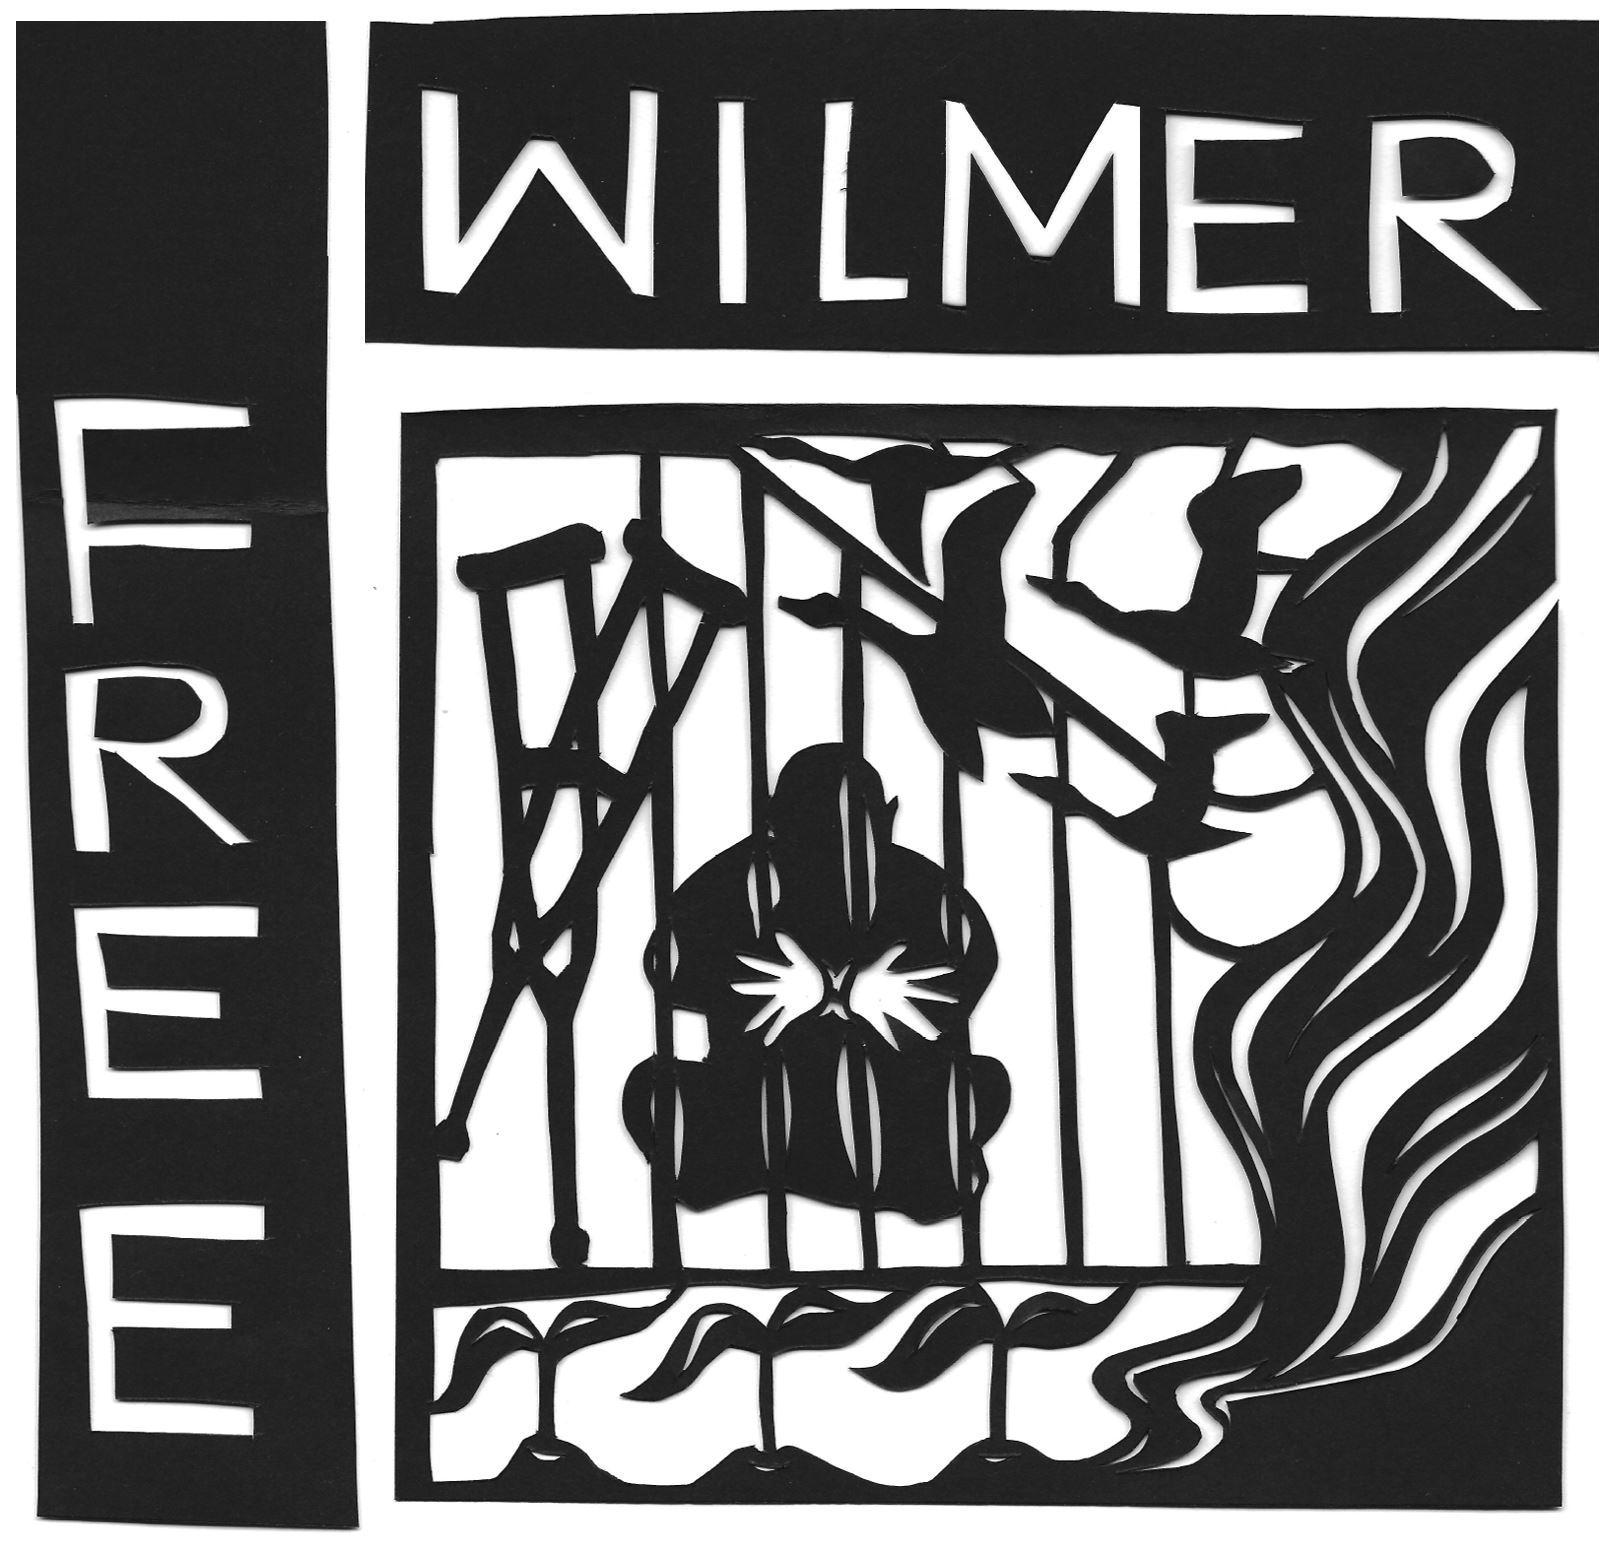 freewilmerfinalllll